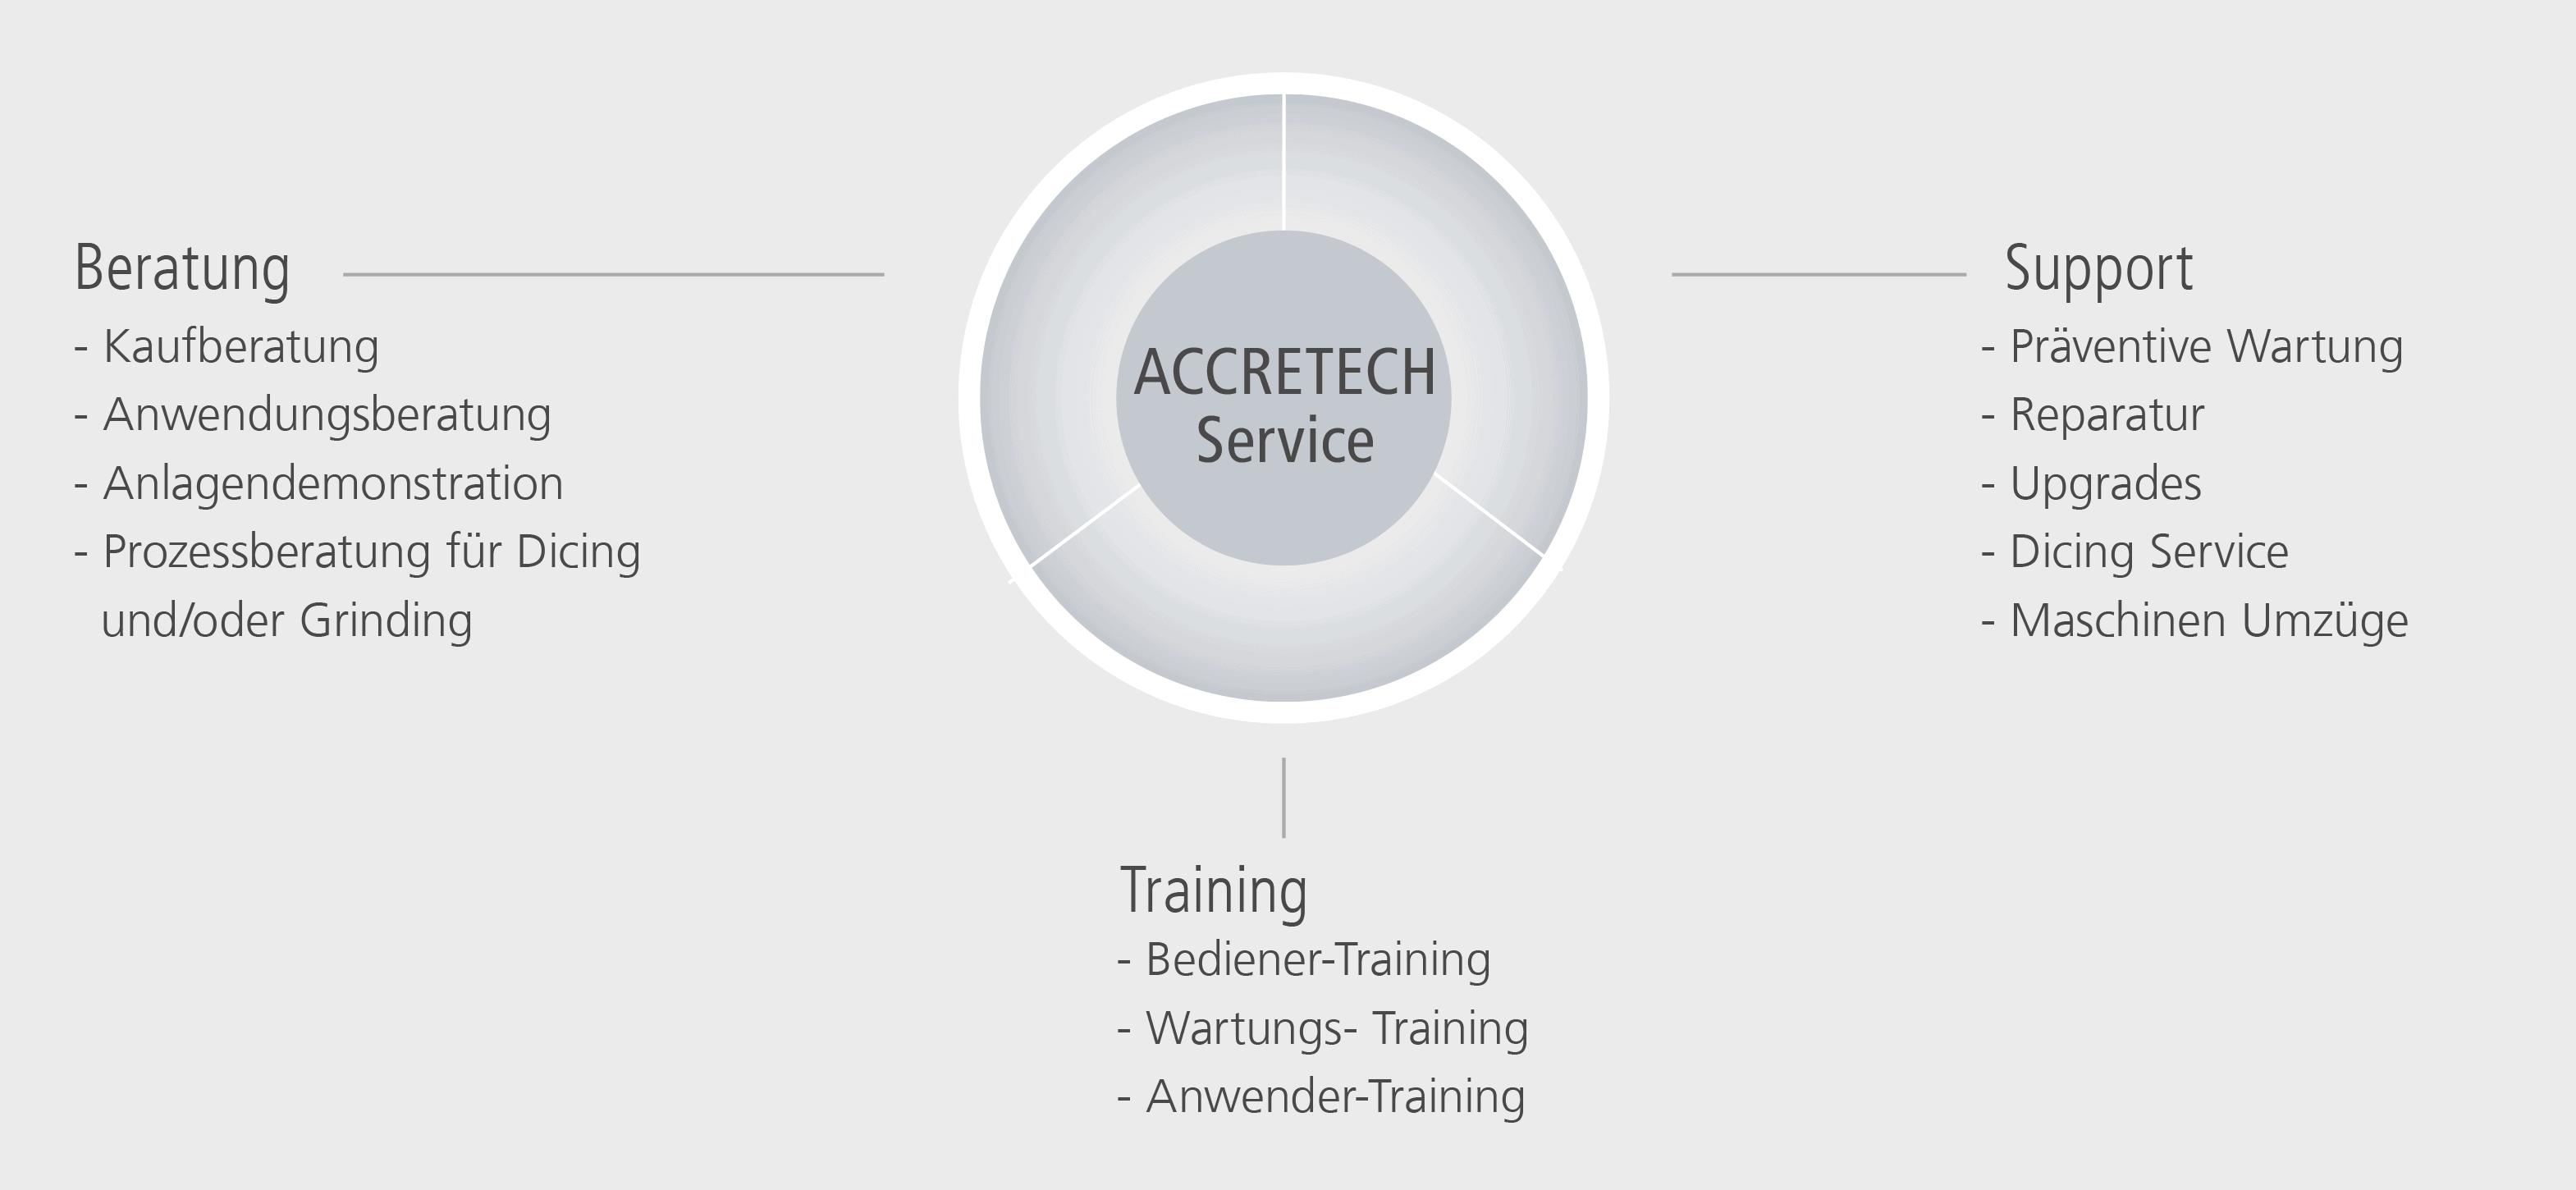 Accretech Service Semiconductor neu